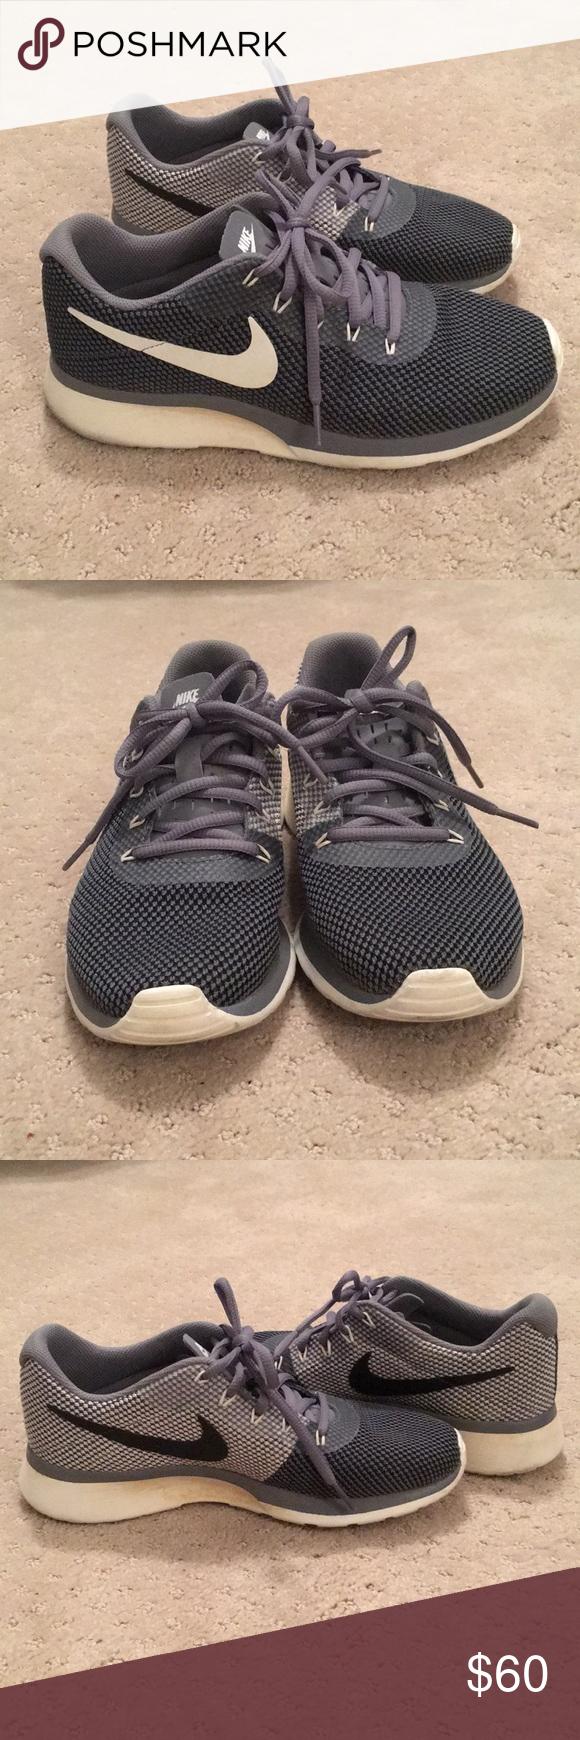 Women's Nike Tanjun Racer Tennis Shoes lightly Shoes Sneakers